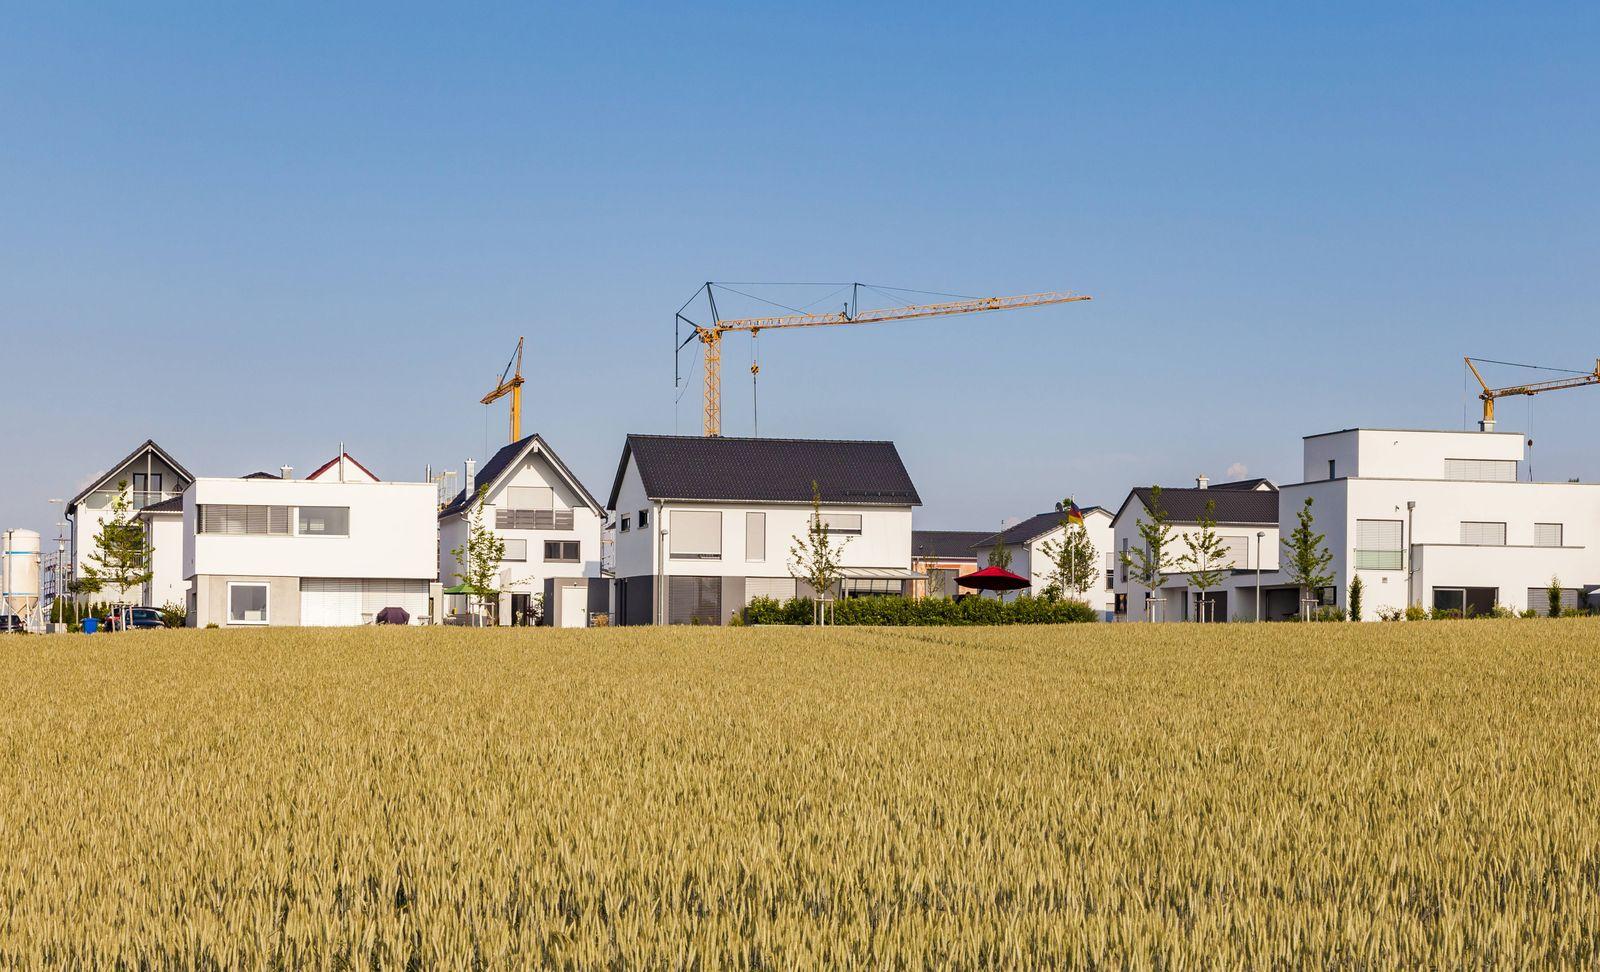 Germany Baden Wuerttemberg Ulm Lehr modern one family houses cranes PUBLICATIONxINxGERxSUIxAUTx